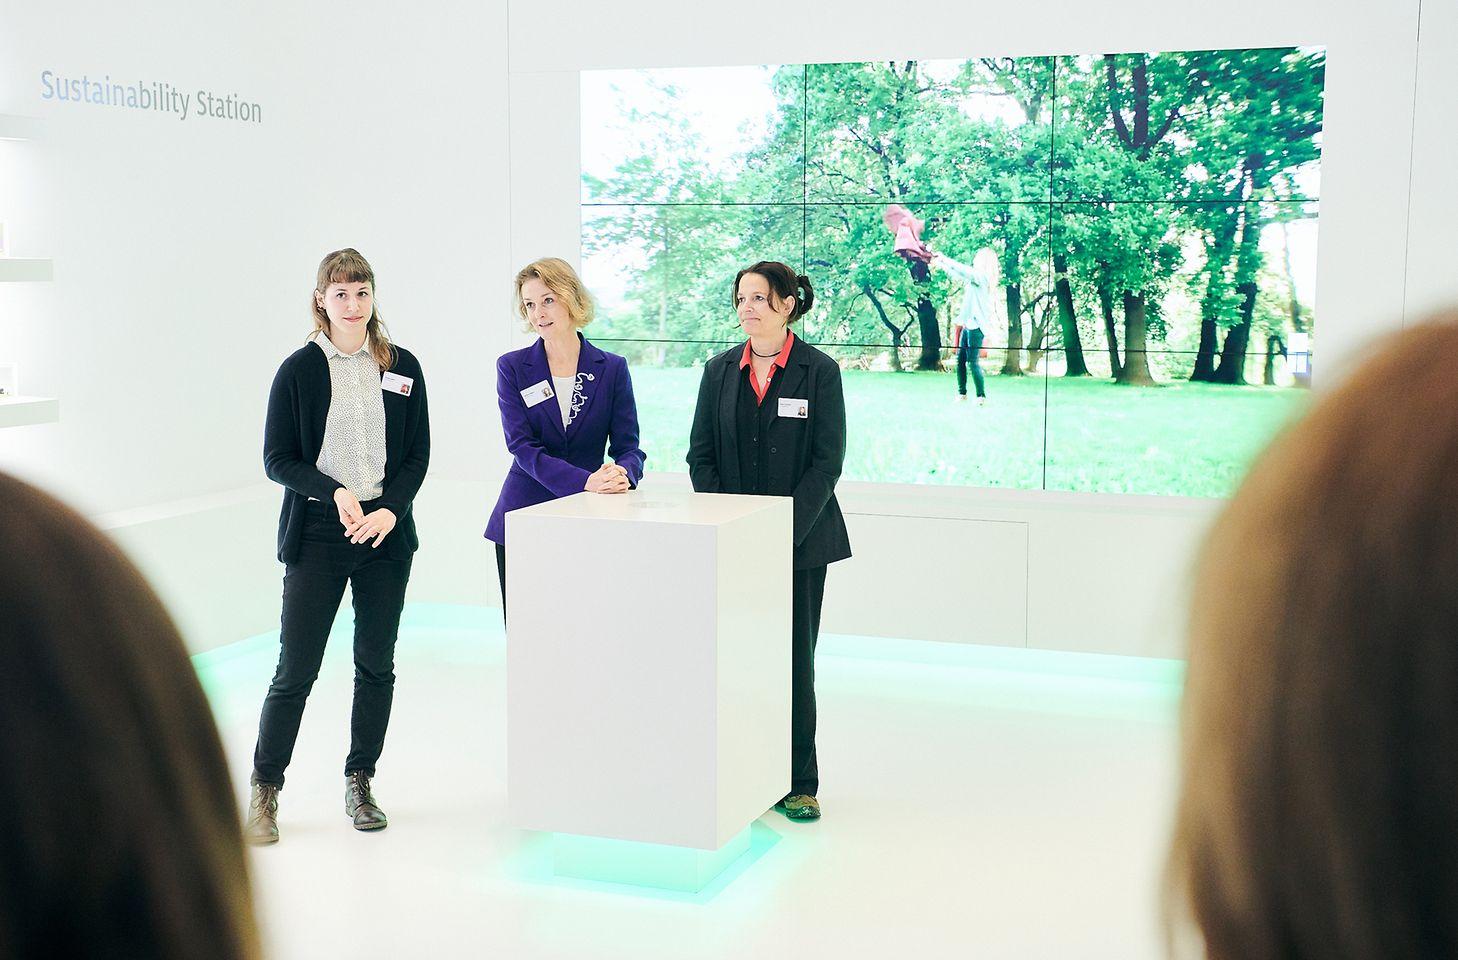 Schwarzkopf Million Chances Award 2019 - Präsentation CyberMentor